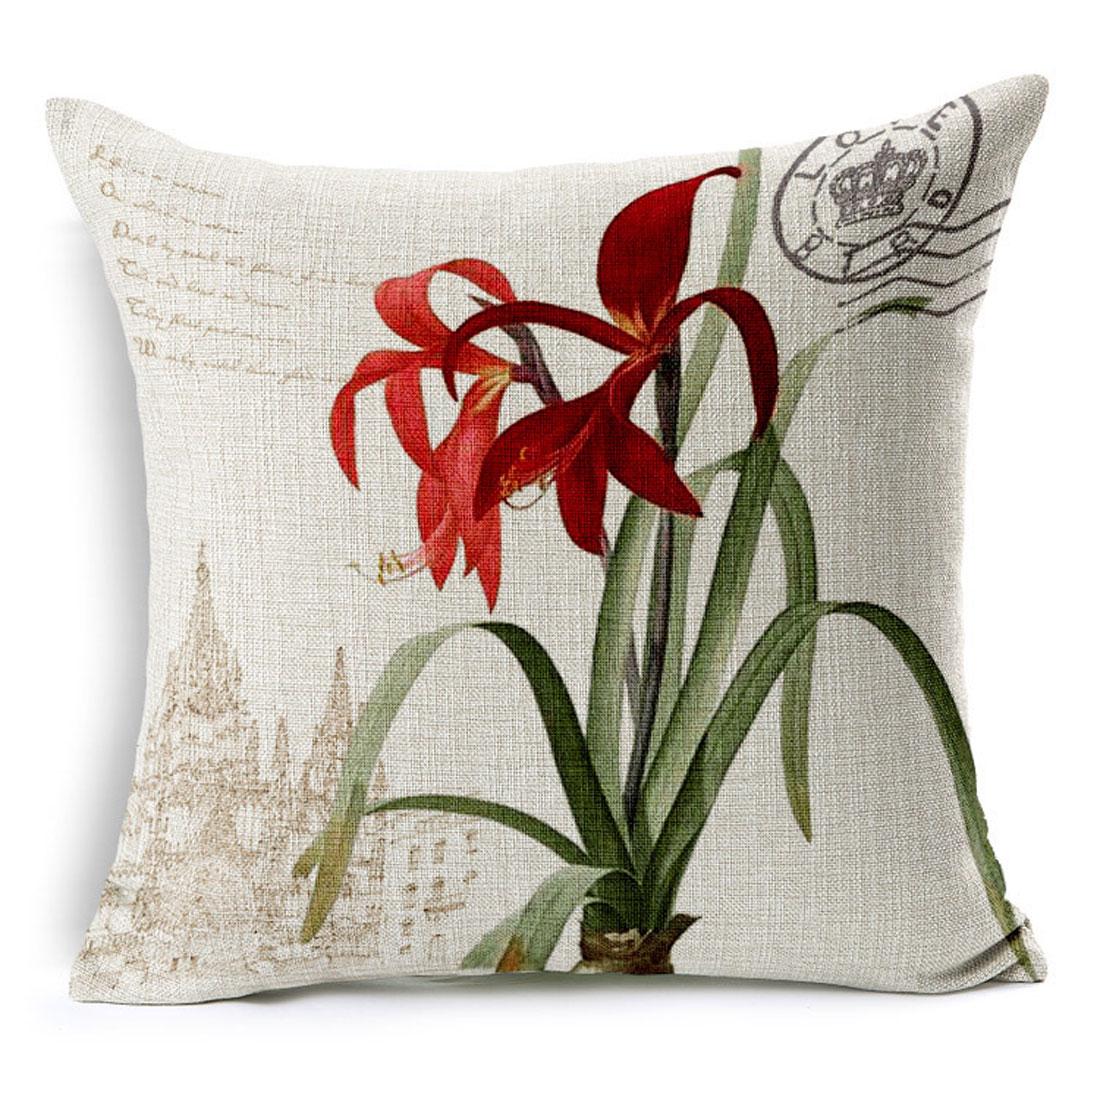 Household Sofa Couch Cotton Linen Hosta Pattern Waist Throw Cushion Cover Pillow Case